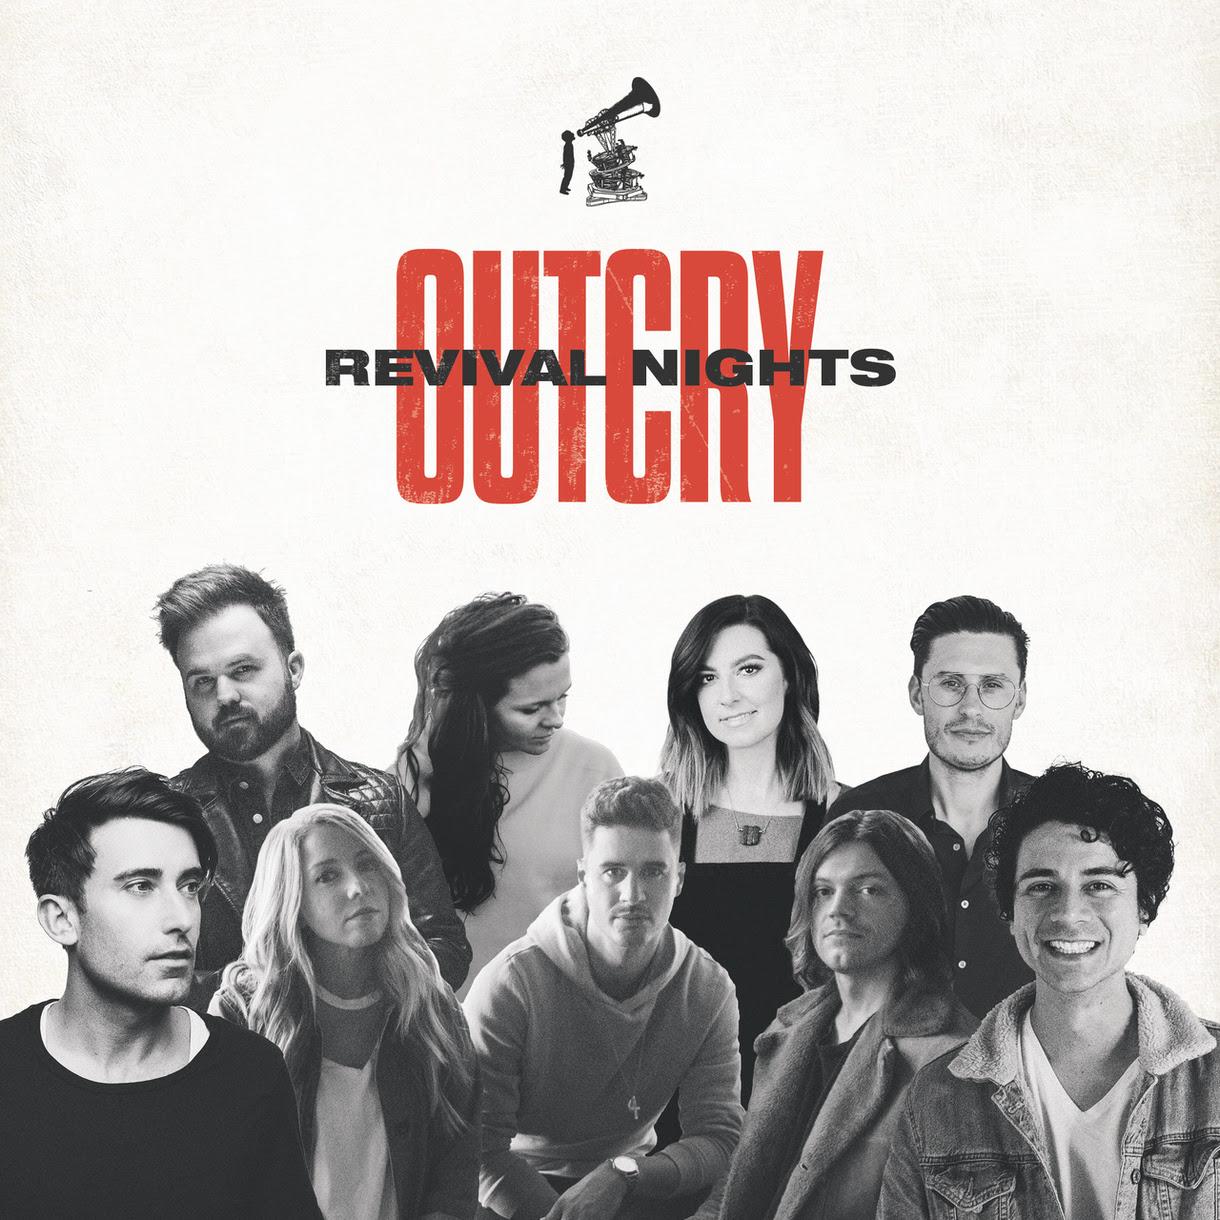 Premier Productions Presents OUTCRY Revival Nights Tour 2019